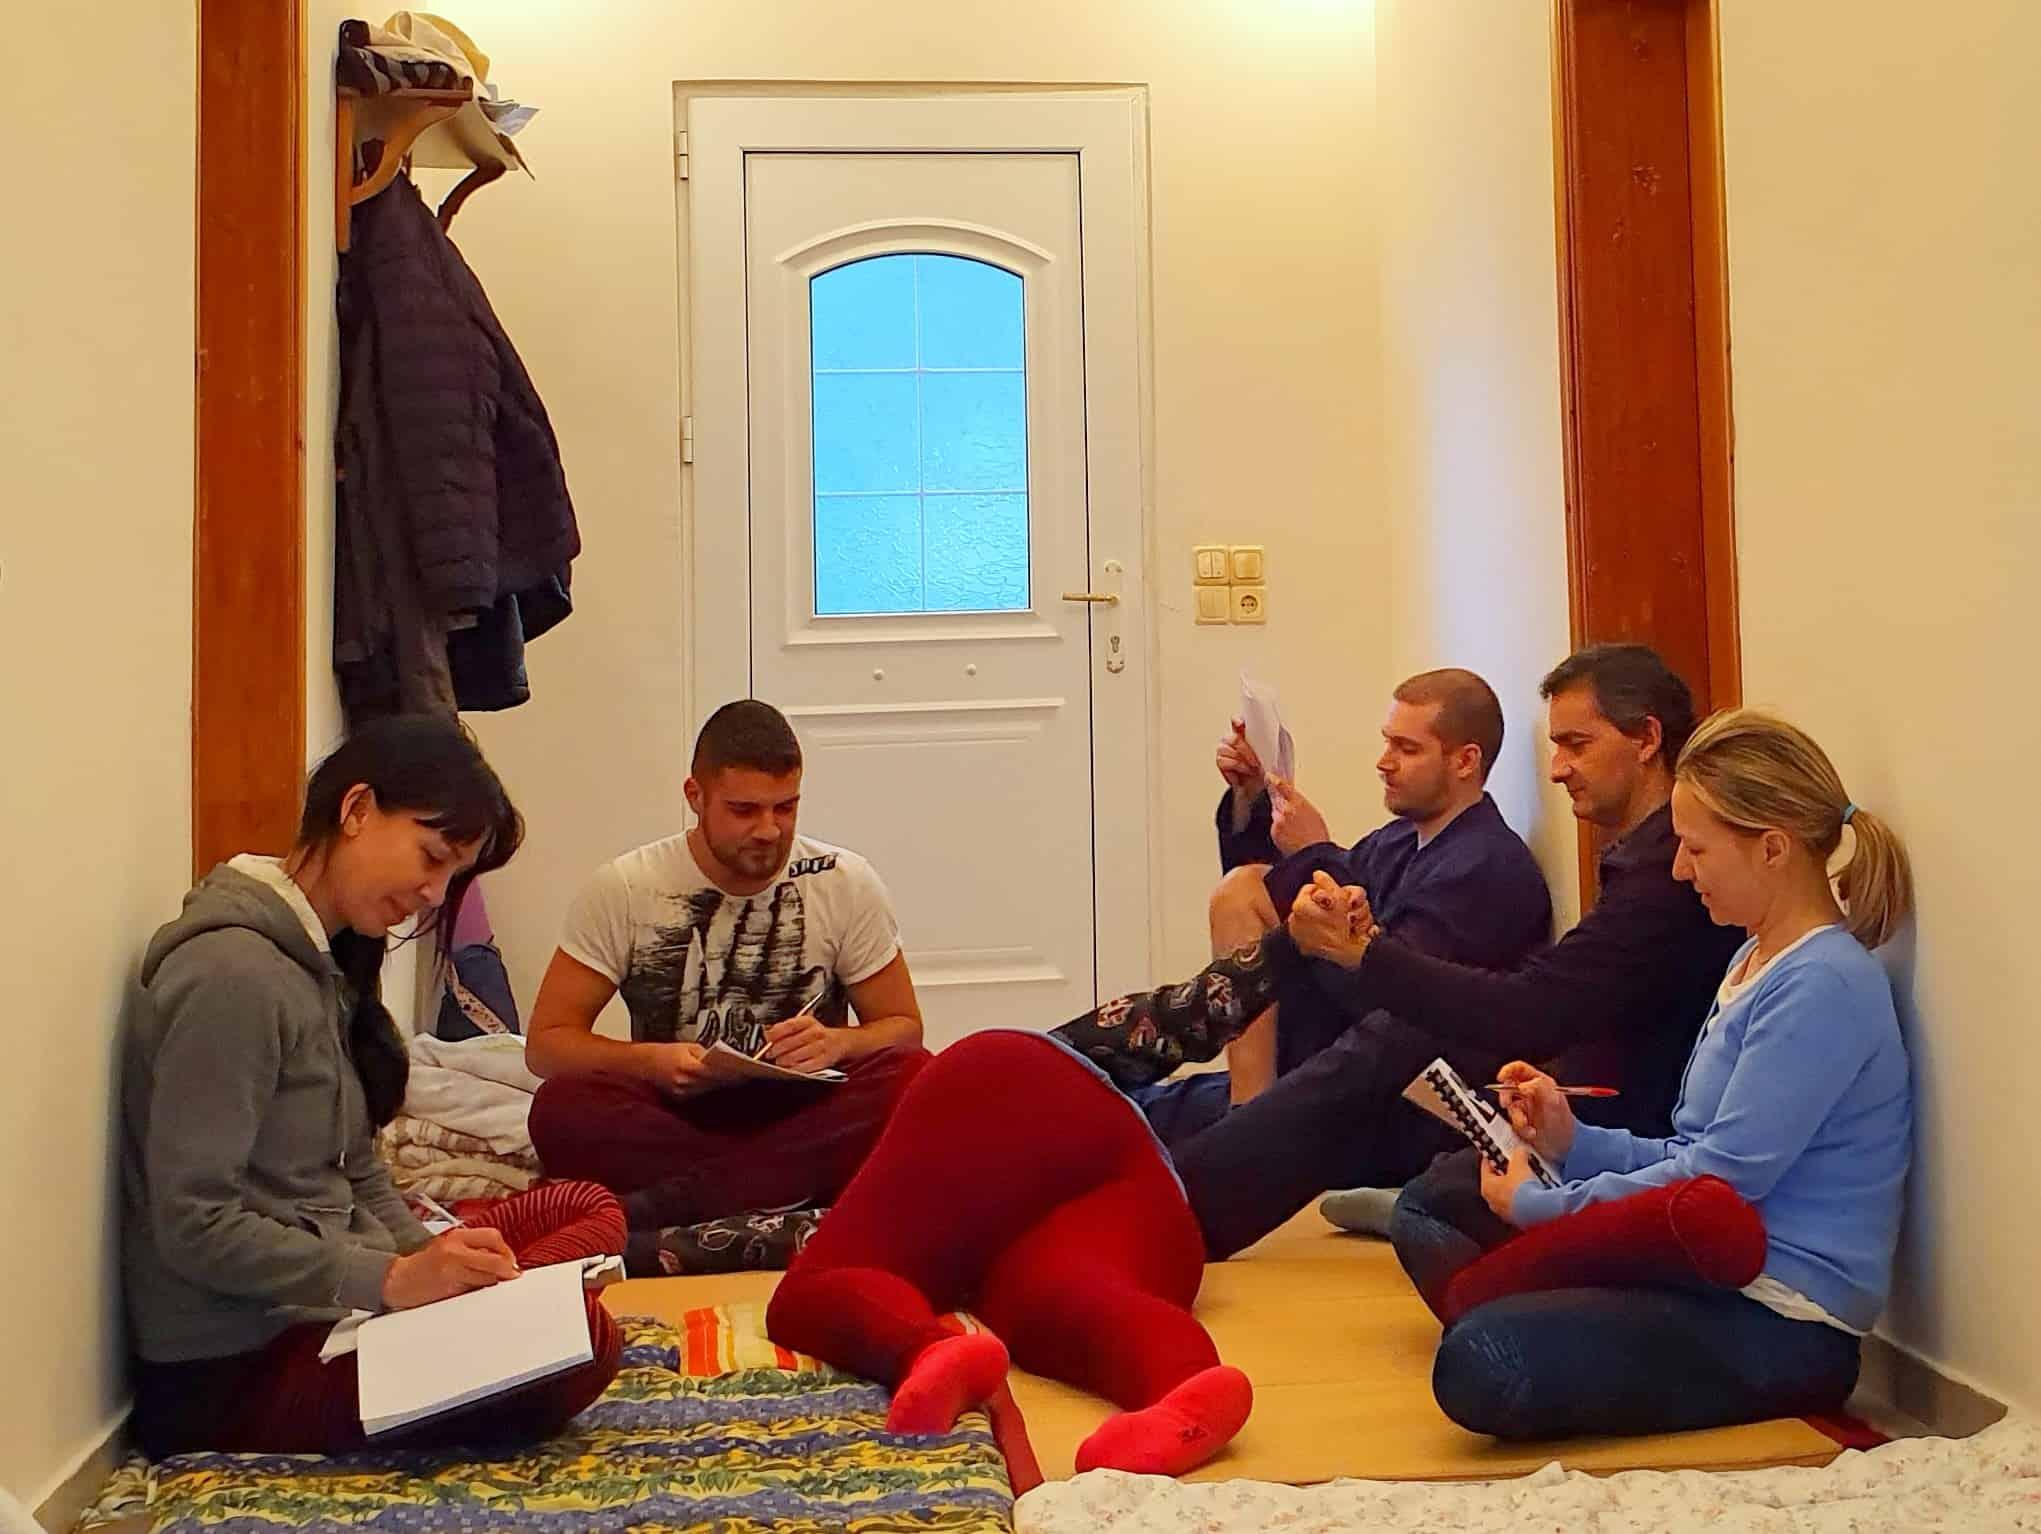 thai massage seminar - 14 Days Thai Massage Training and Yoga Retreat in Crete Greece